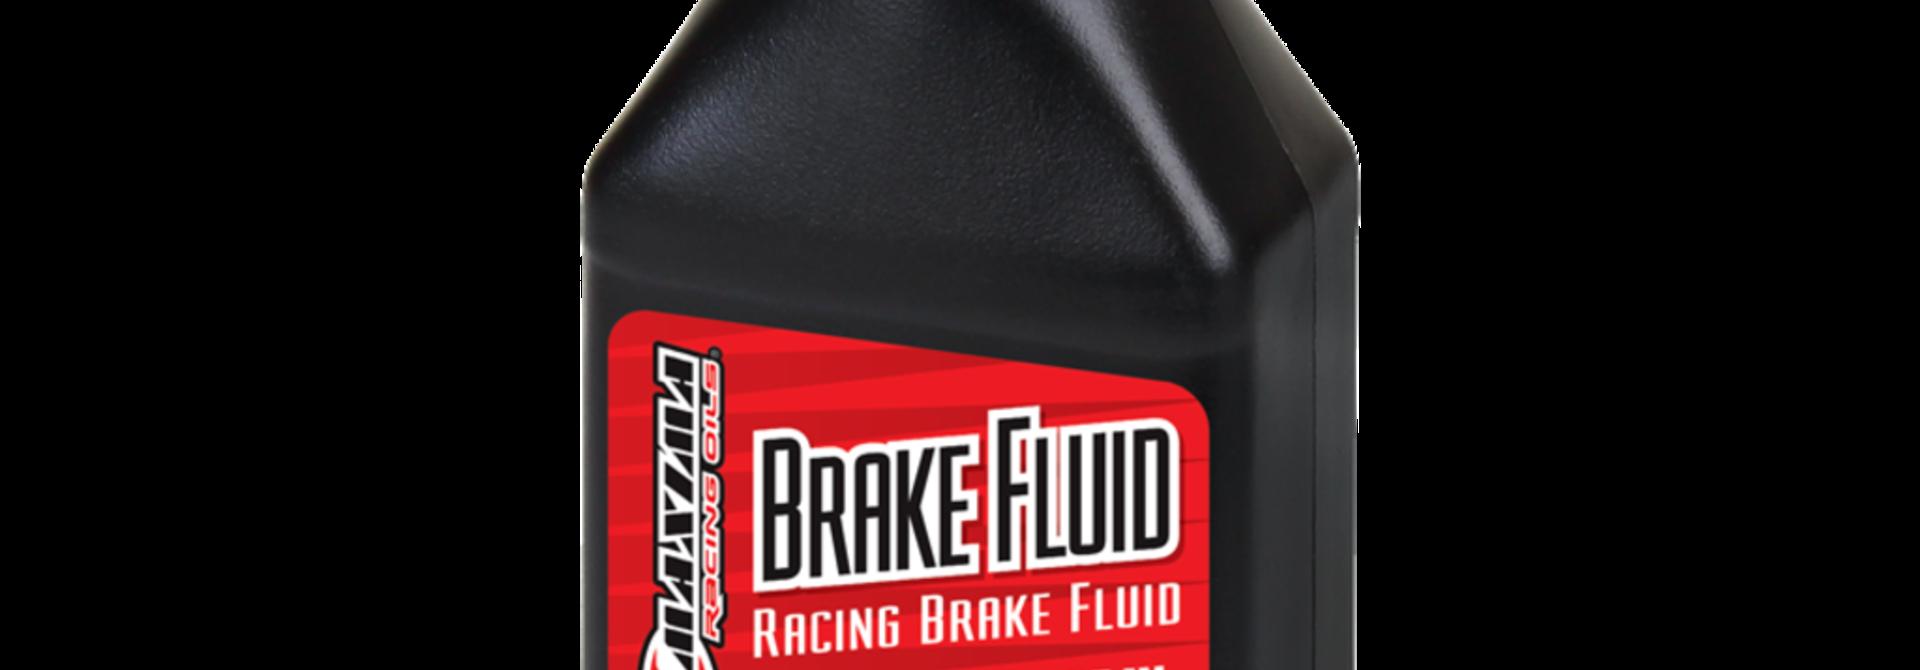 Maxima DOT 5.1 Racing Brake Fluid (4oz/118ml)